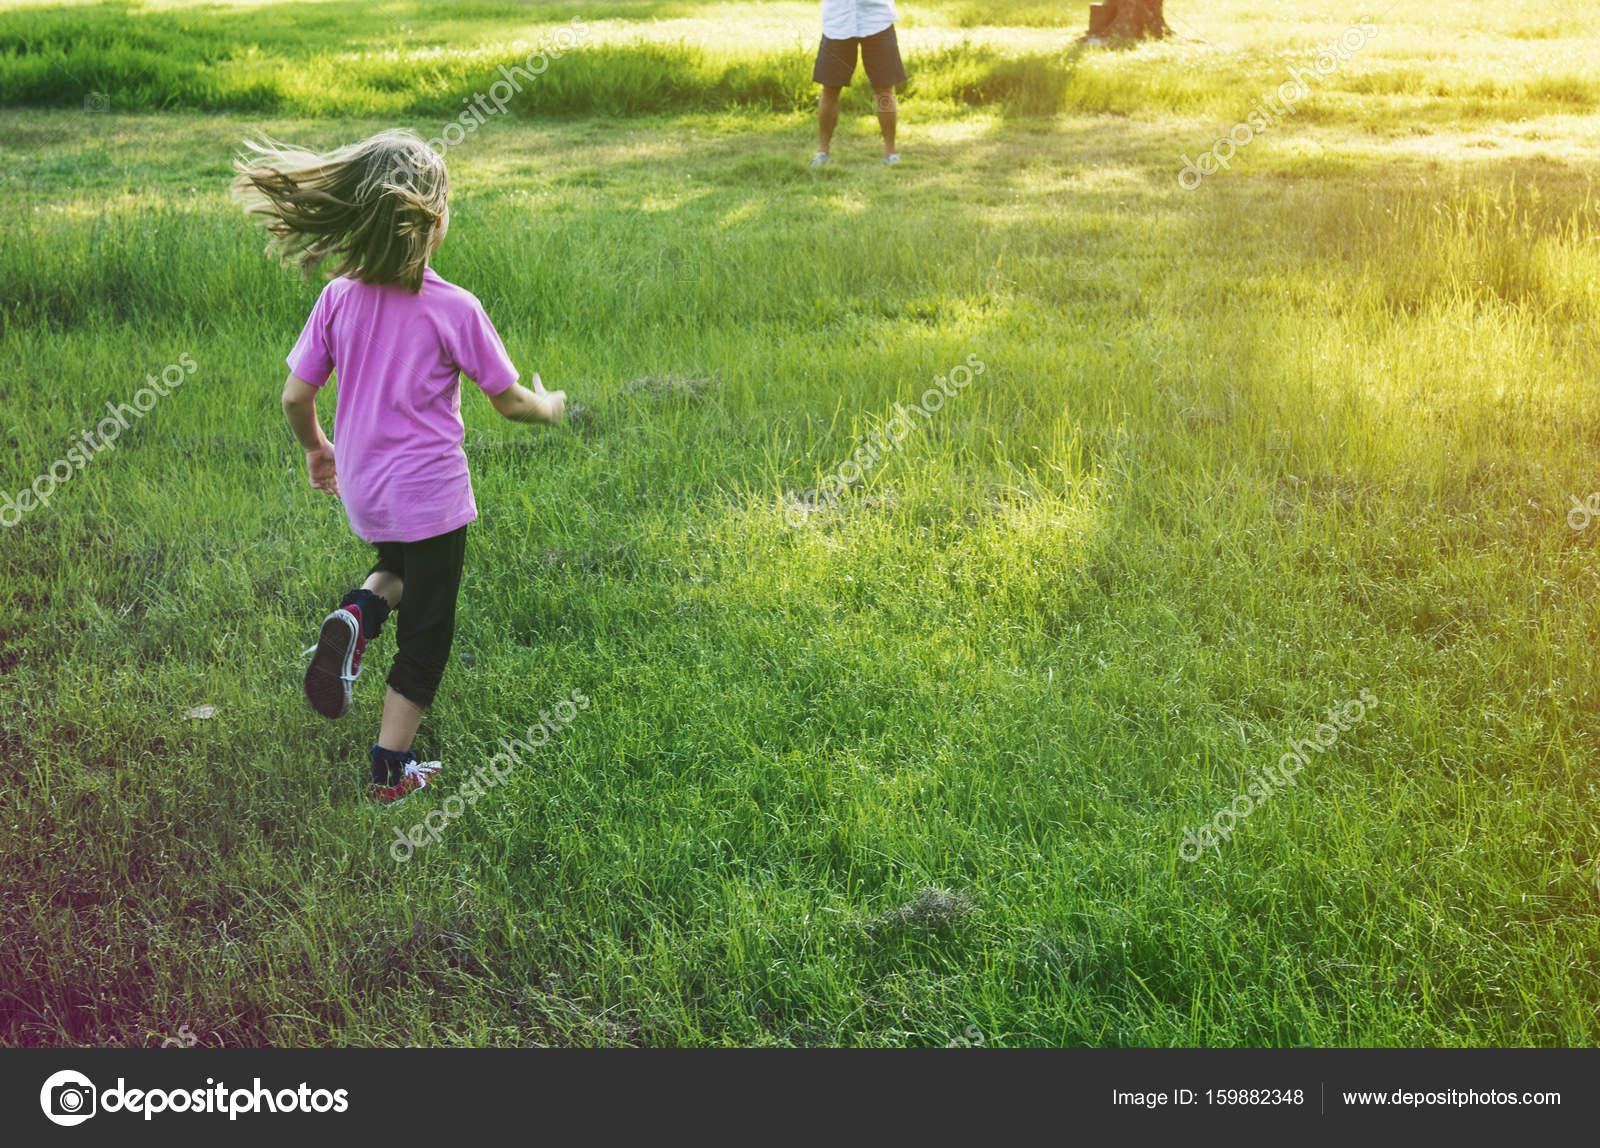 e3b275a8cf5b5f Mädchen läuft in Wiese — Stockfoto © Rawpixel  159882348